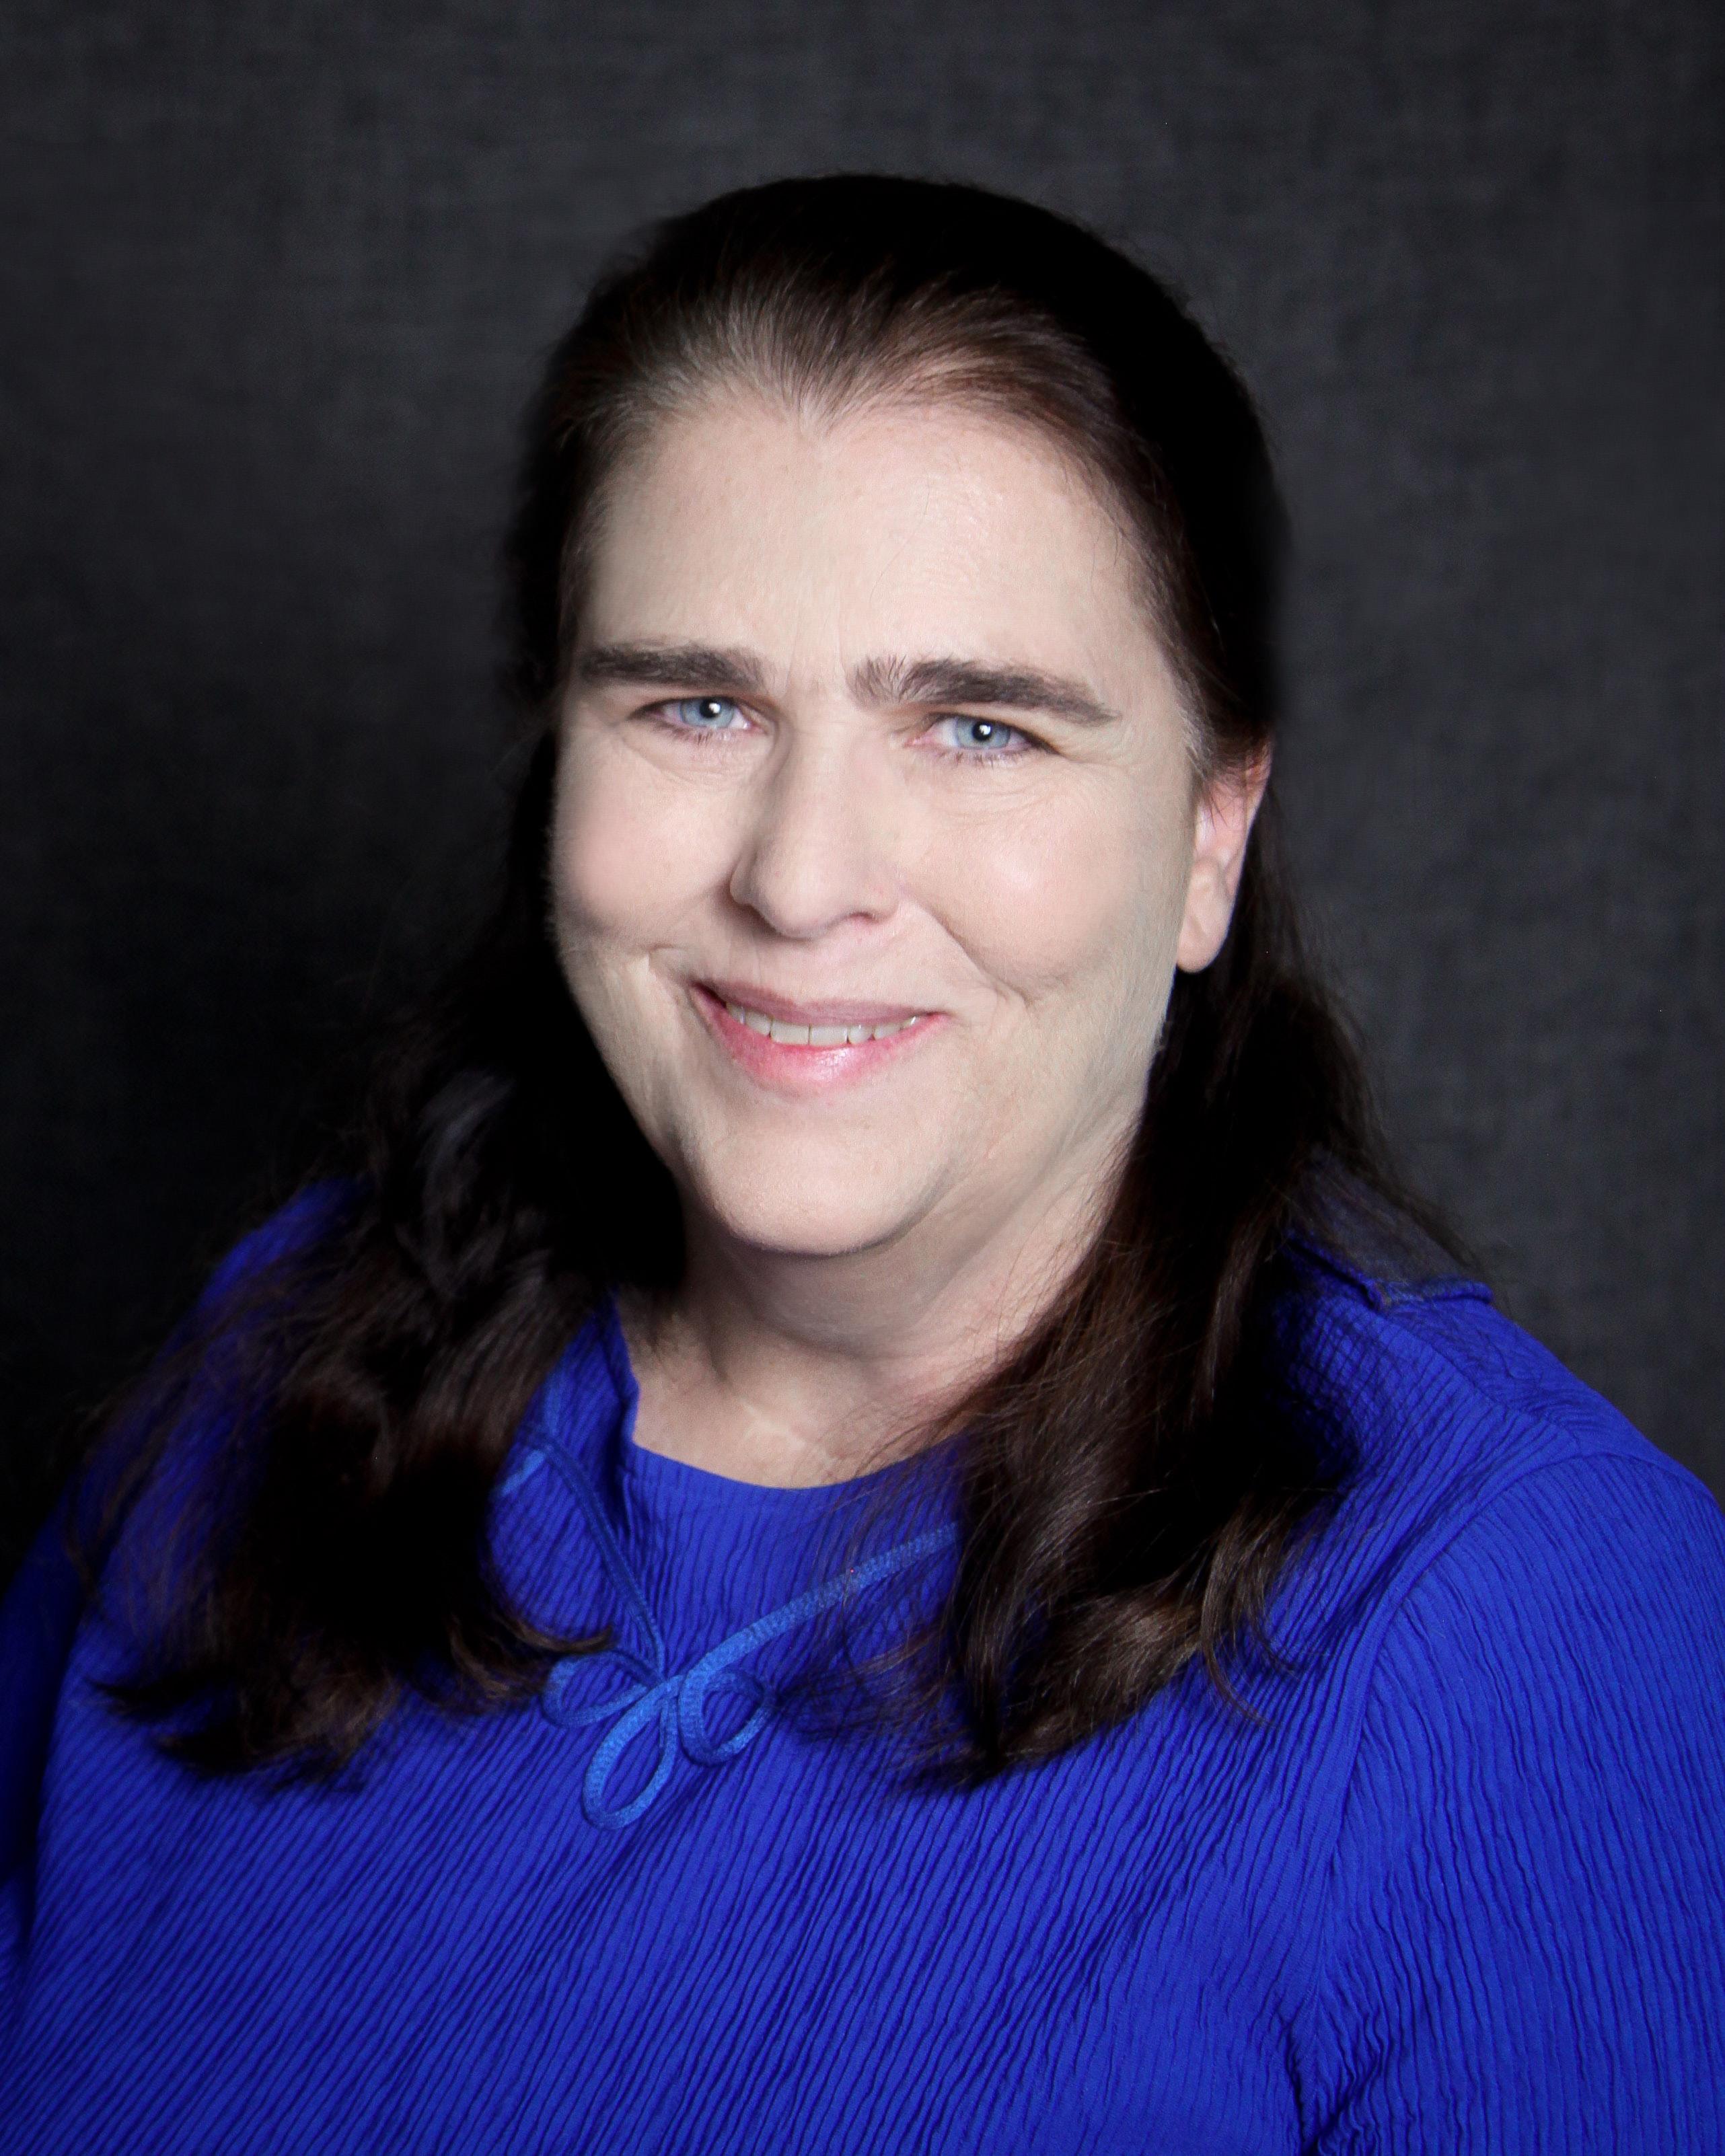 Elisabeth Noelke, MD, FAAFP